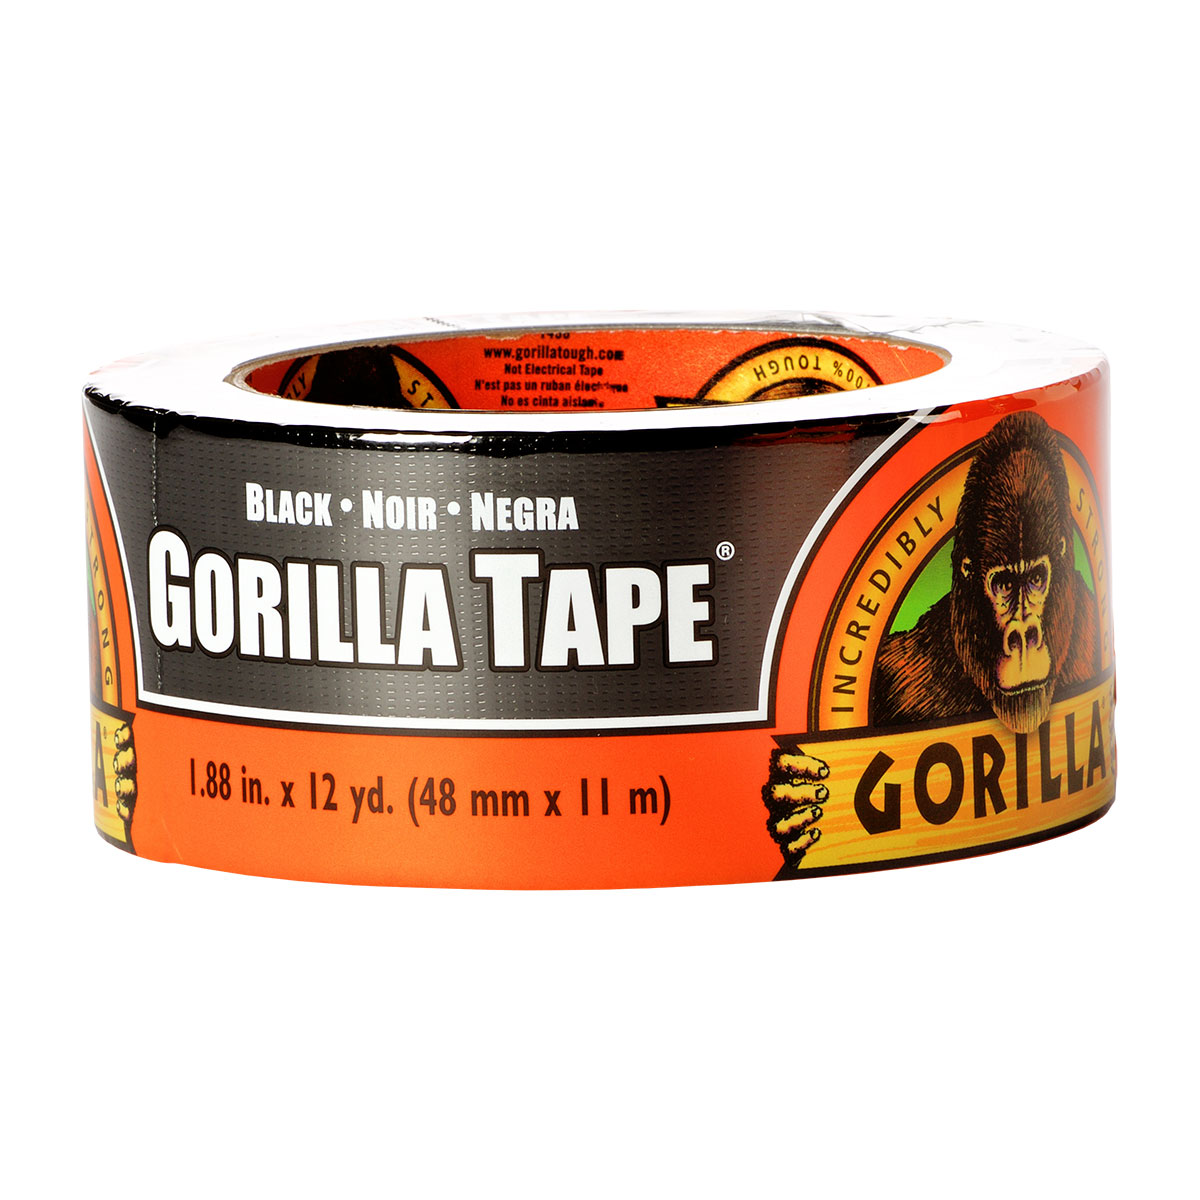 Gorilla Tape, 12yd Black